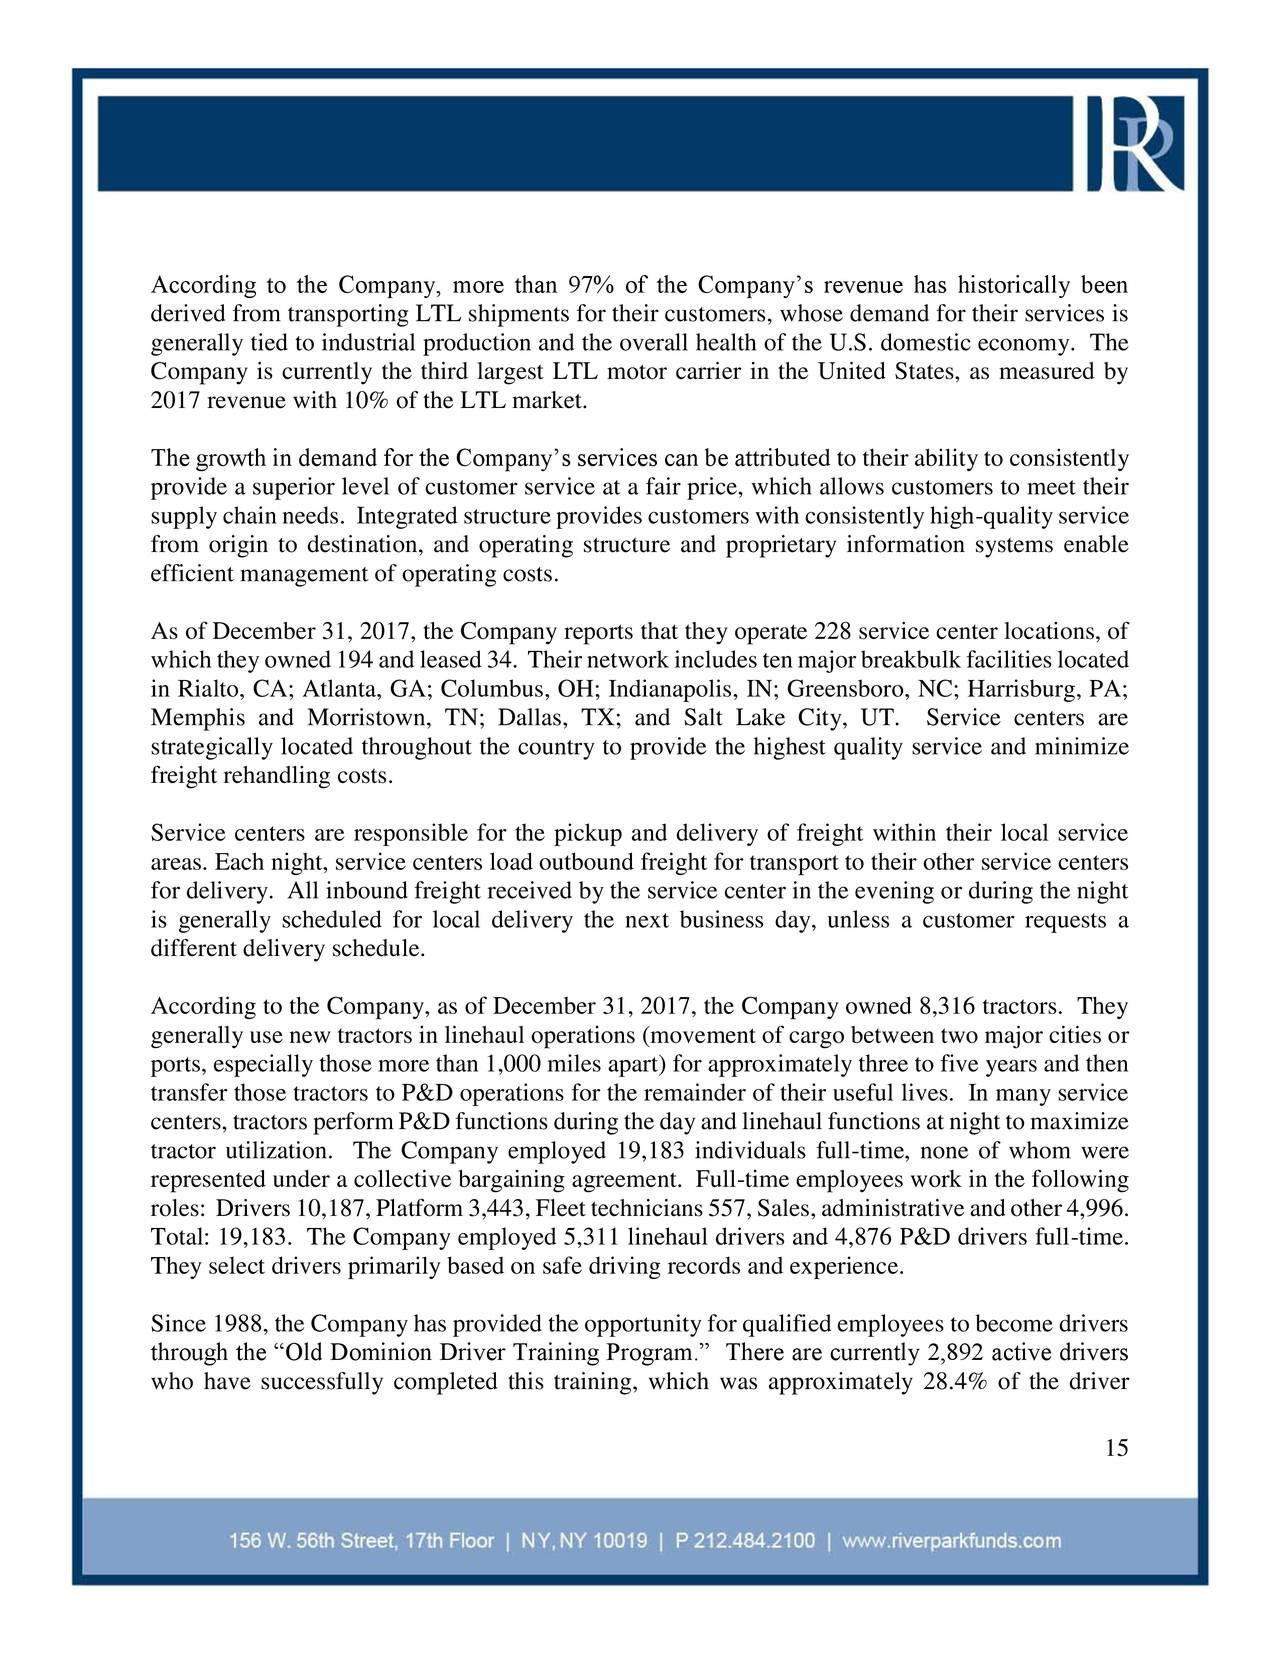 RiverPark Wedgewood Fund Q3 2018 Investor Letter ...